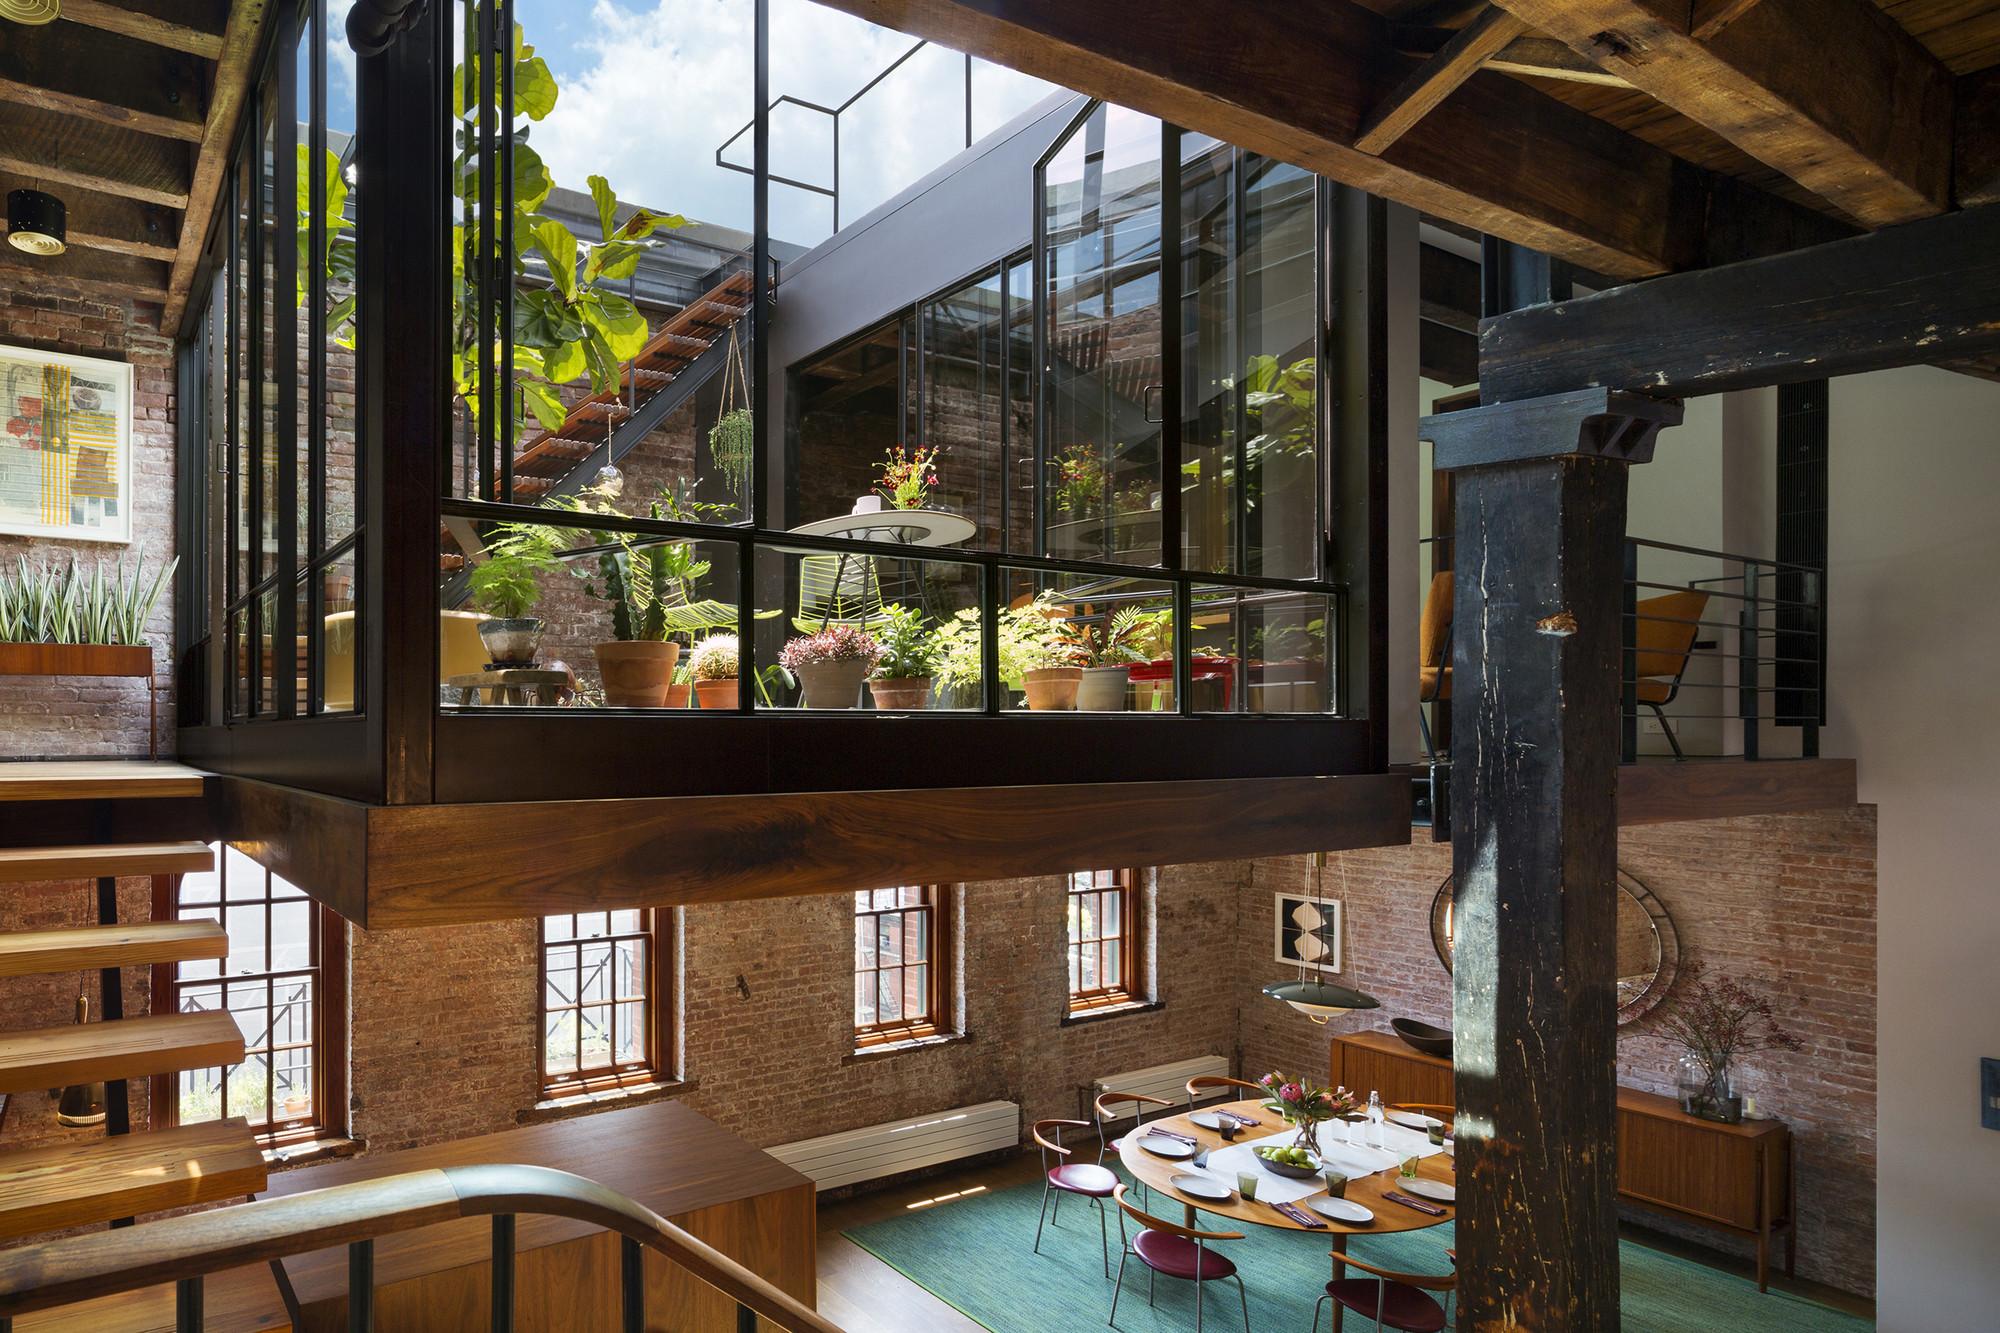 New York City Loft Apartment Rentals. Nyc Loft Apartments Nyc Loft ...